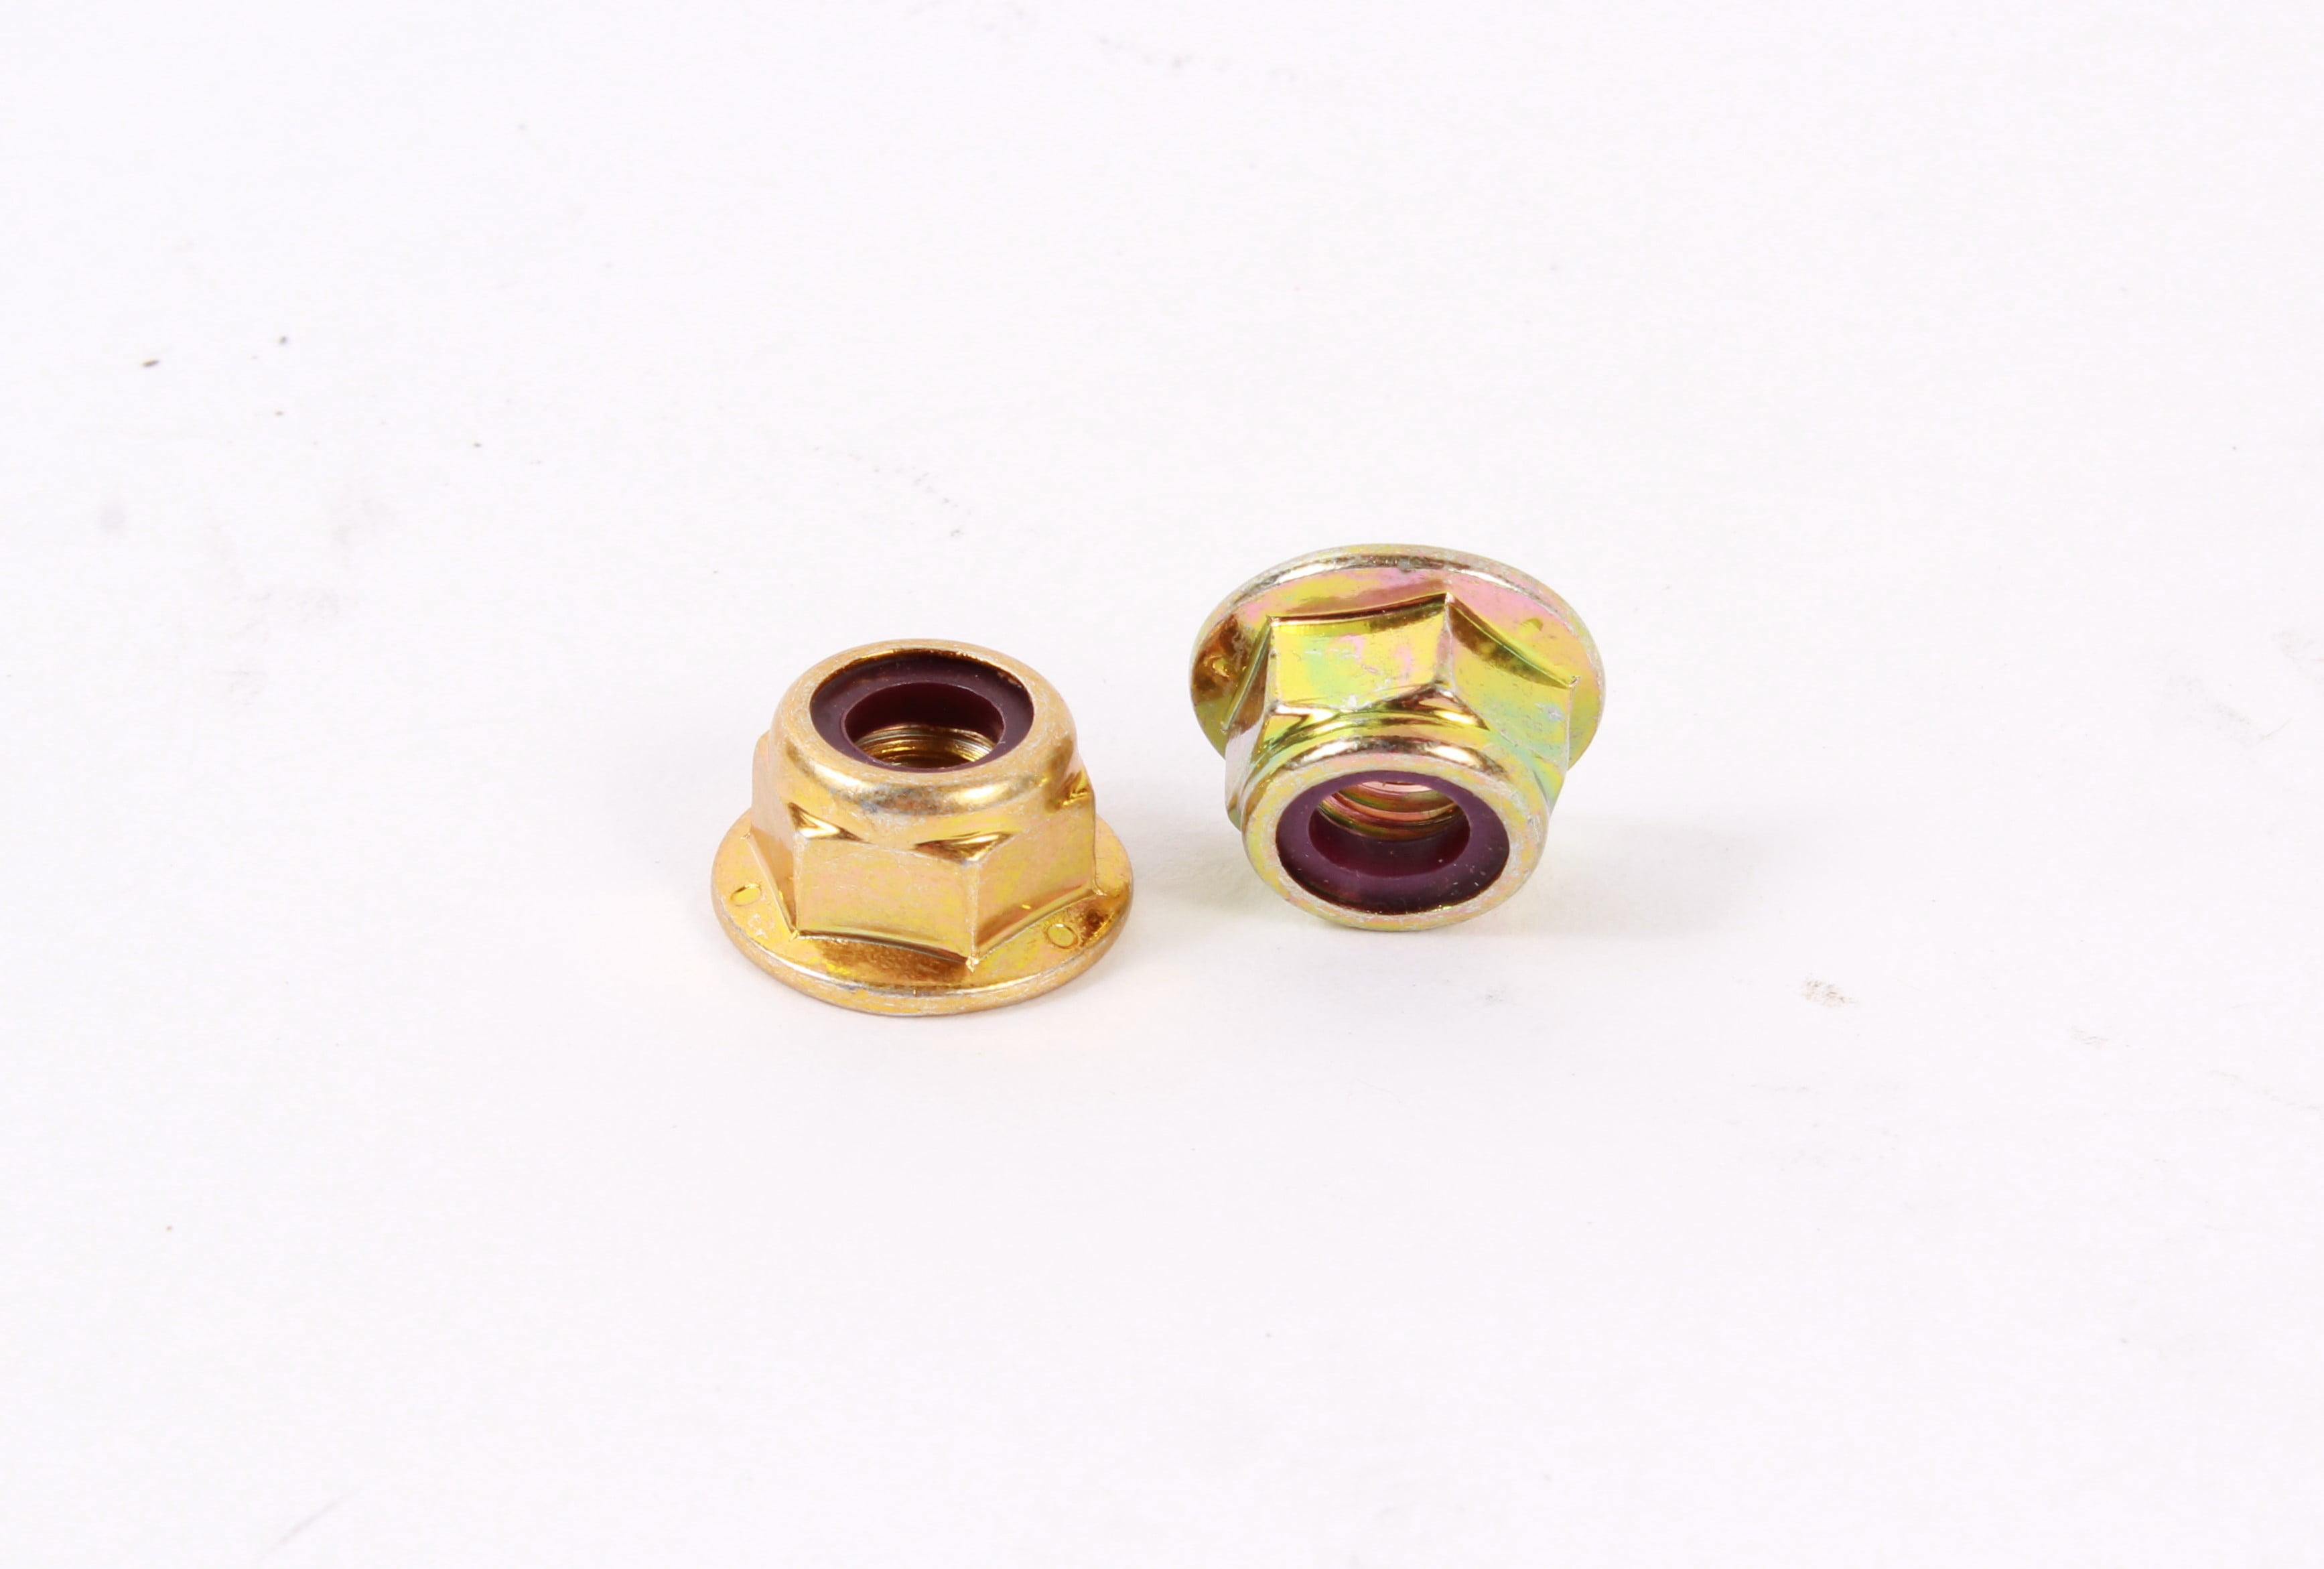 2 Pack MTD 712-04063 Hex Flange Lock Nut For Columbia Craftsman Huskee Troy Bilt by MTD